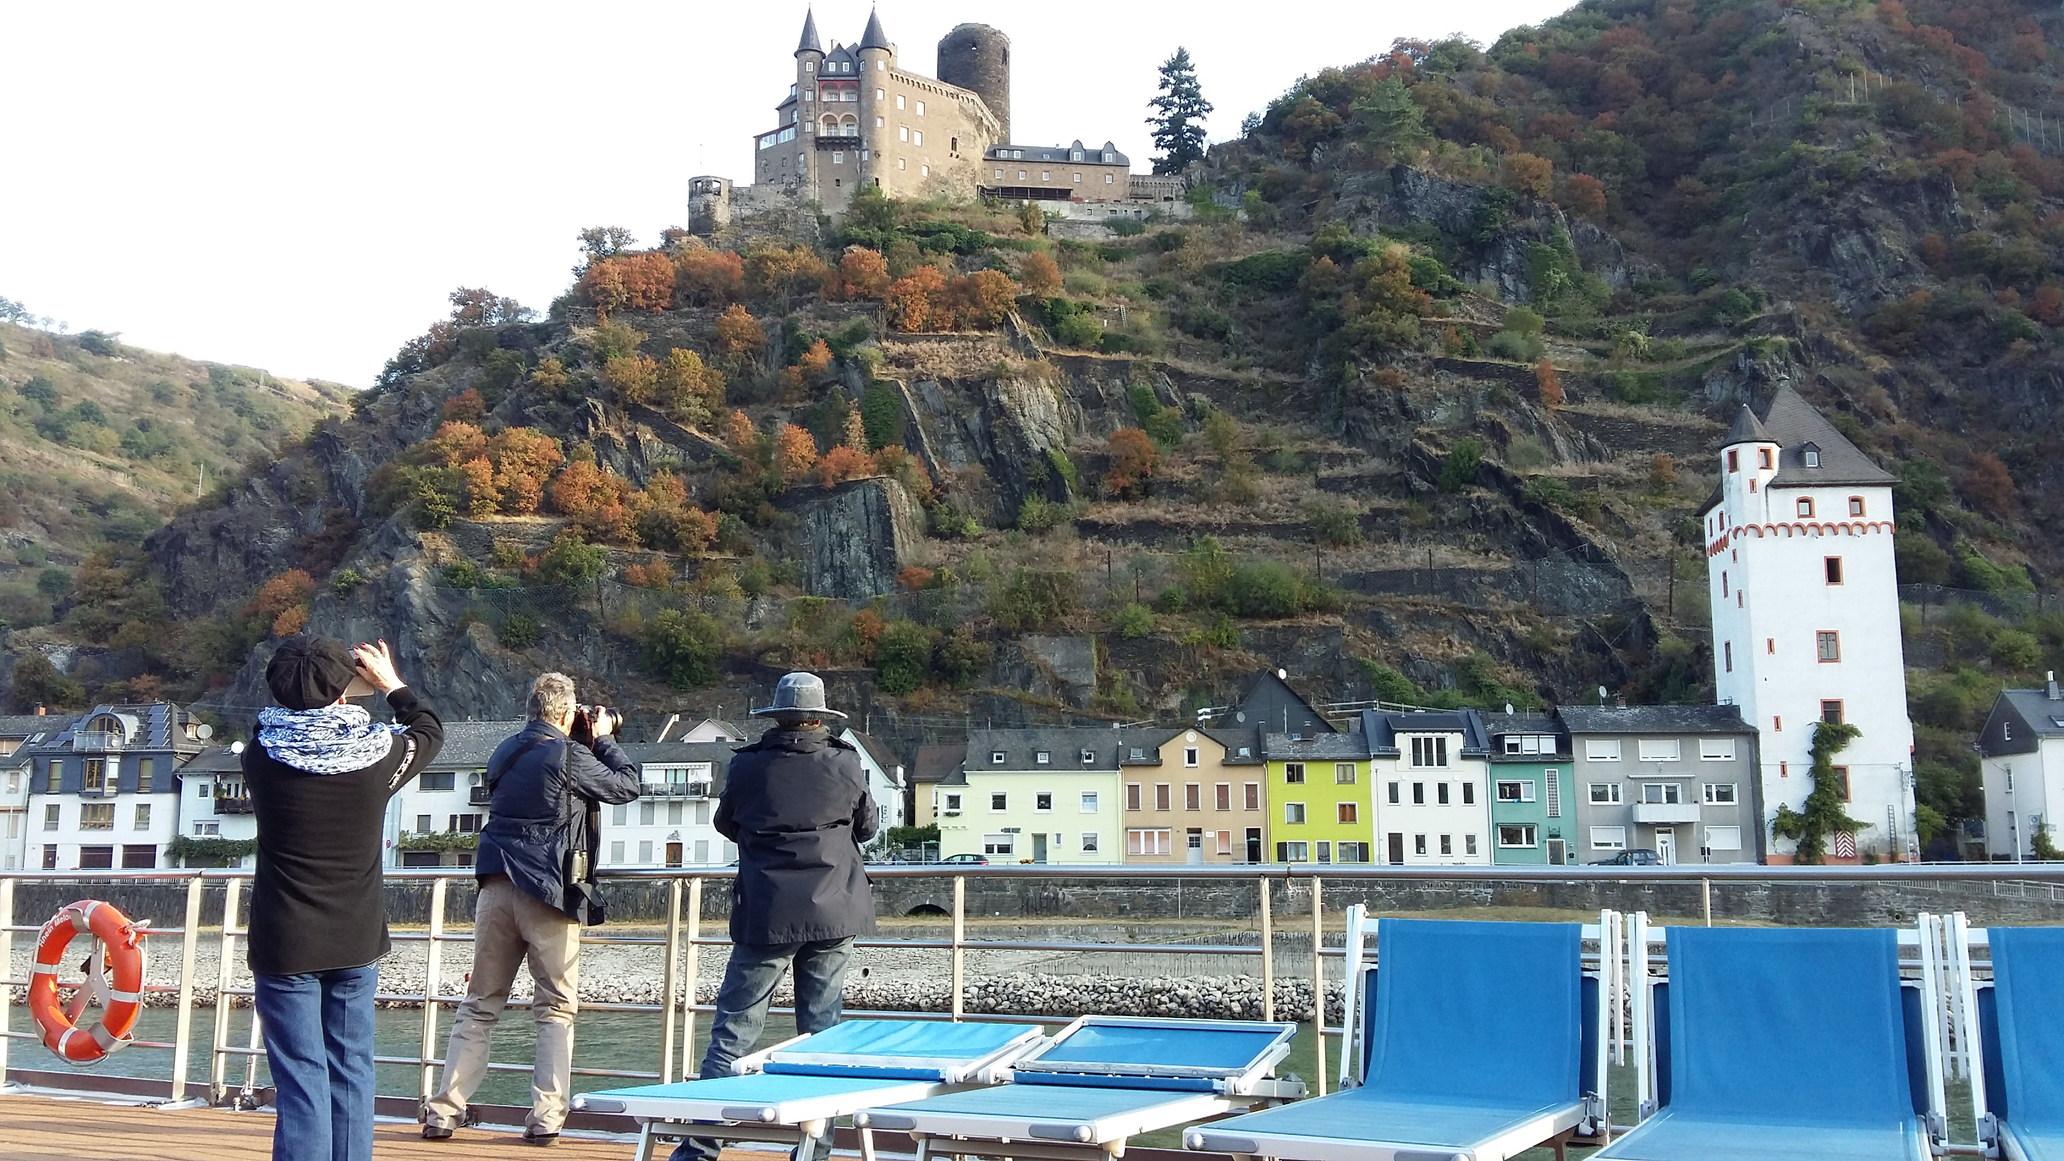 Boat Cruise on the Rhein River